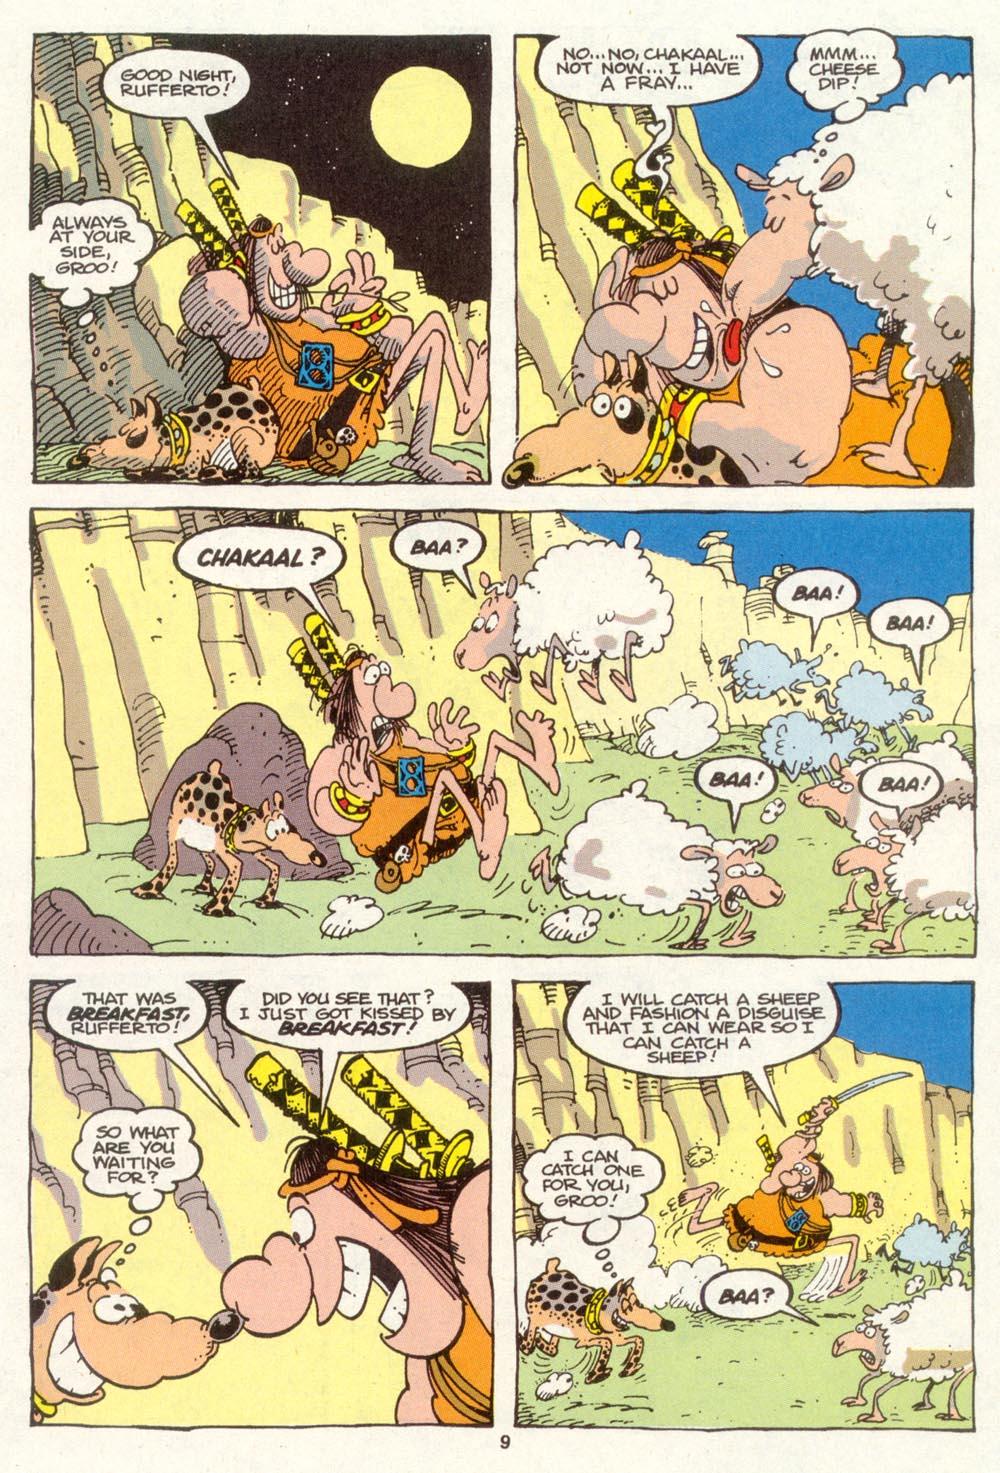 Read online Sergio Aragonés Groo the Wanderer comic -  Issue #88 - 10